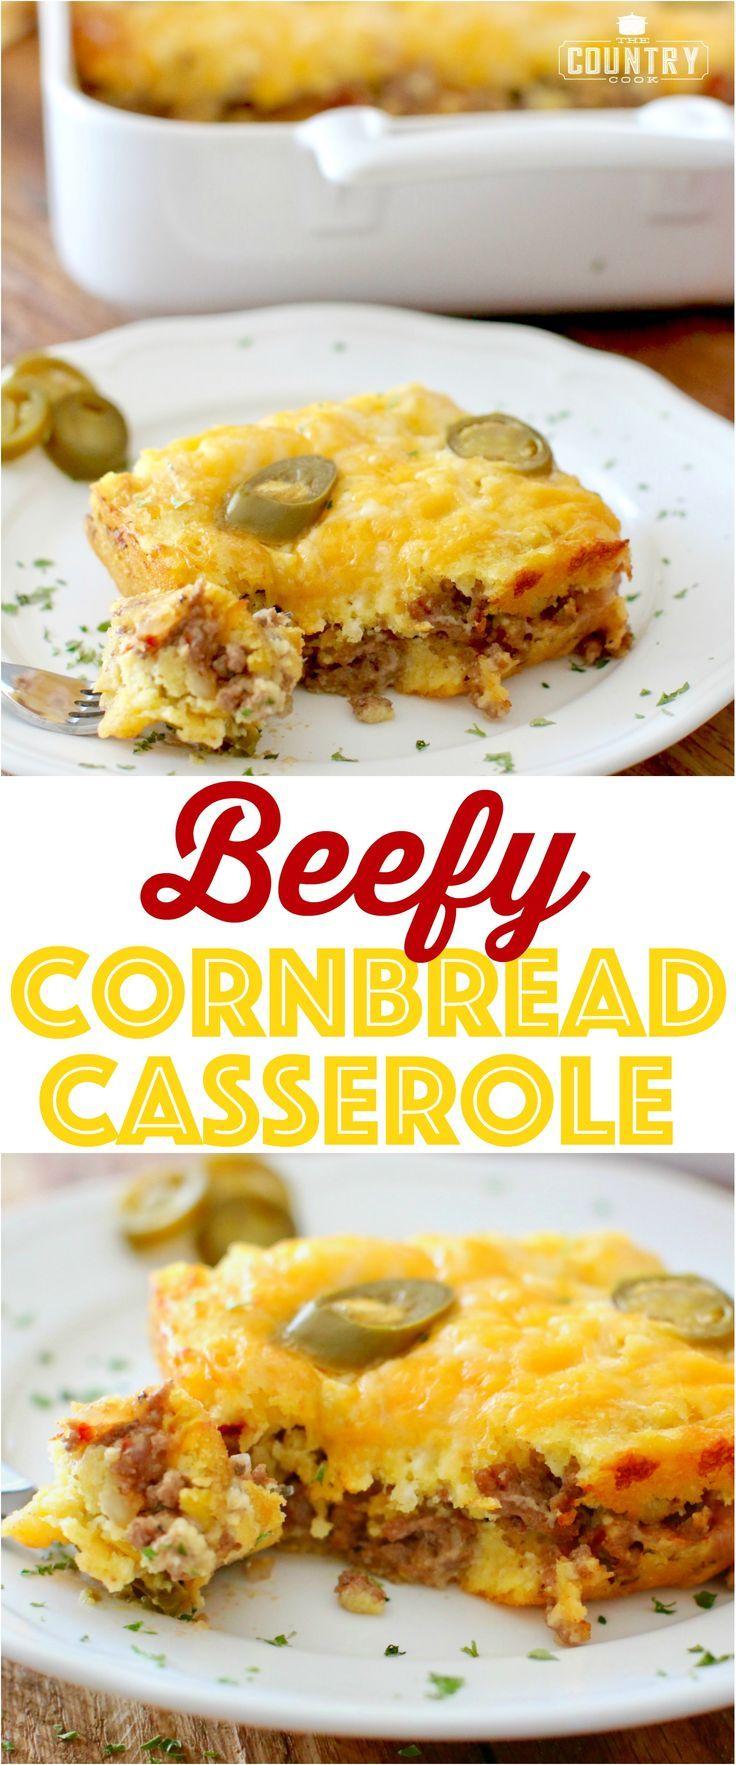 Beefy Cornbread Casserole Recipe Hamburger Recipes Cornbread Casserole Mexican Food Recipes Casserole Recipes